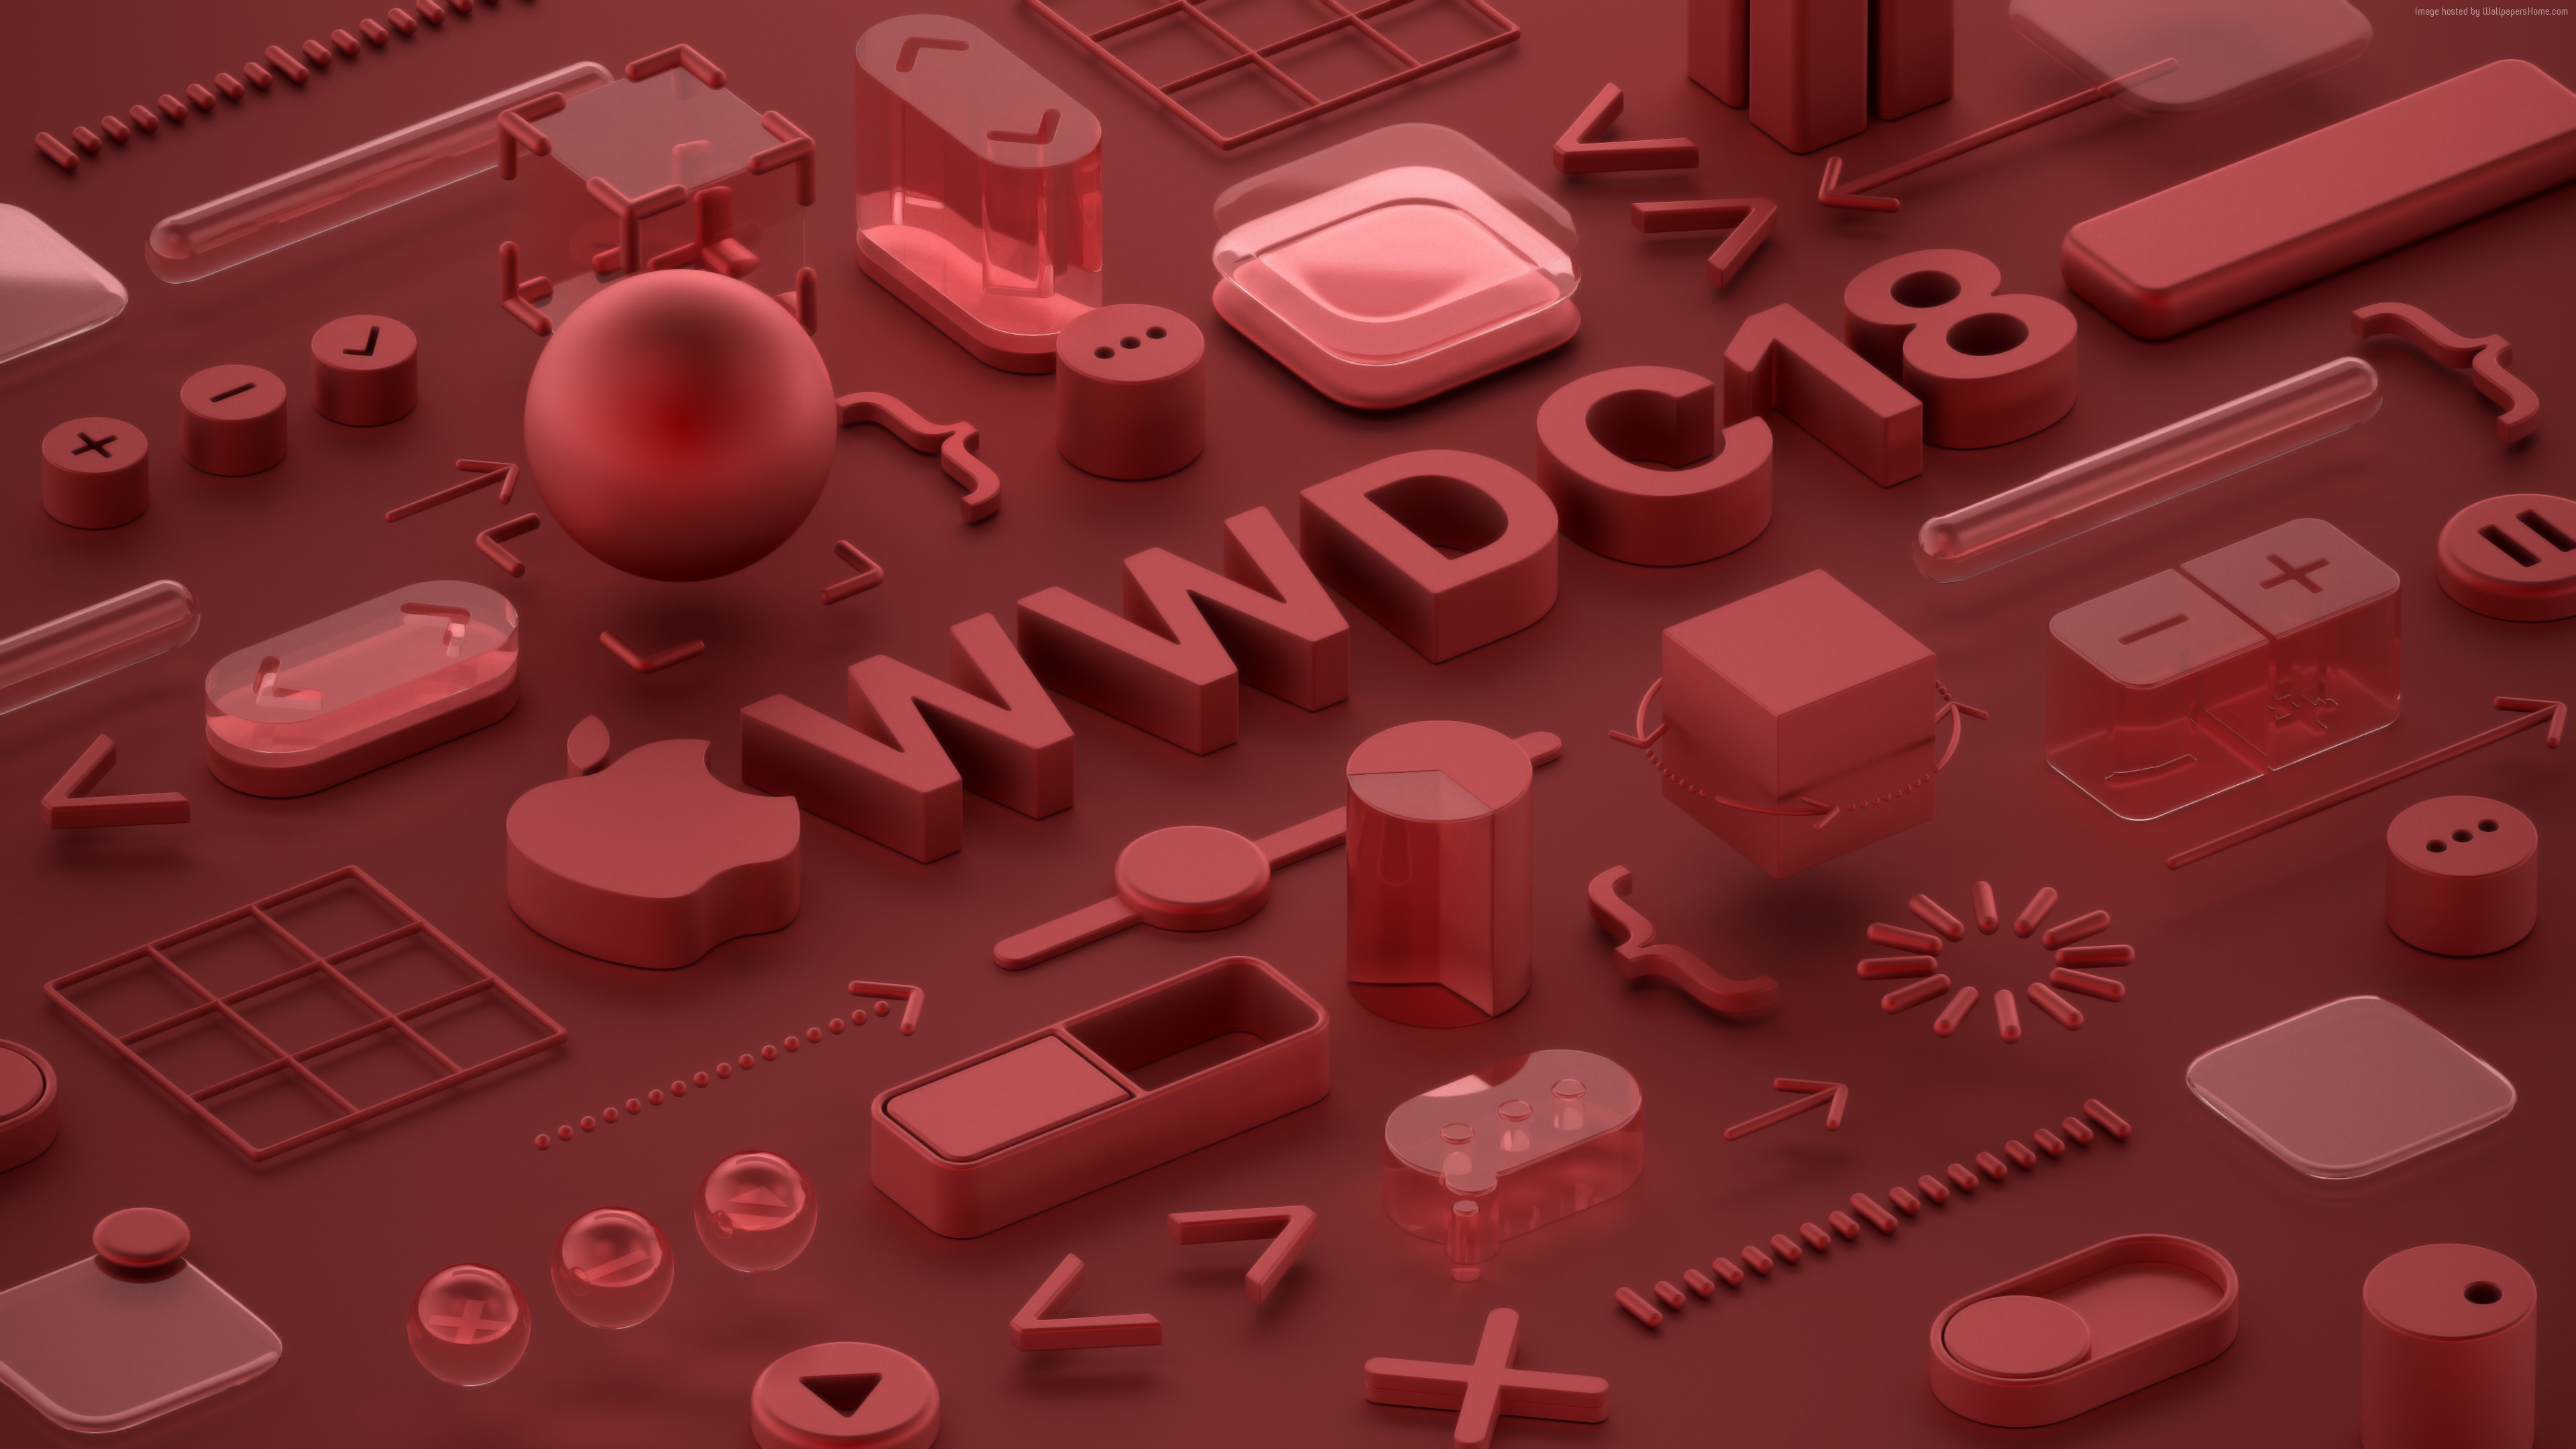 Wallpaper WWDC 2018, Bronze, 3D, 4K, Hi-Tech Wallpaper